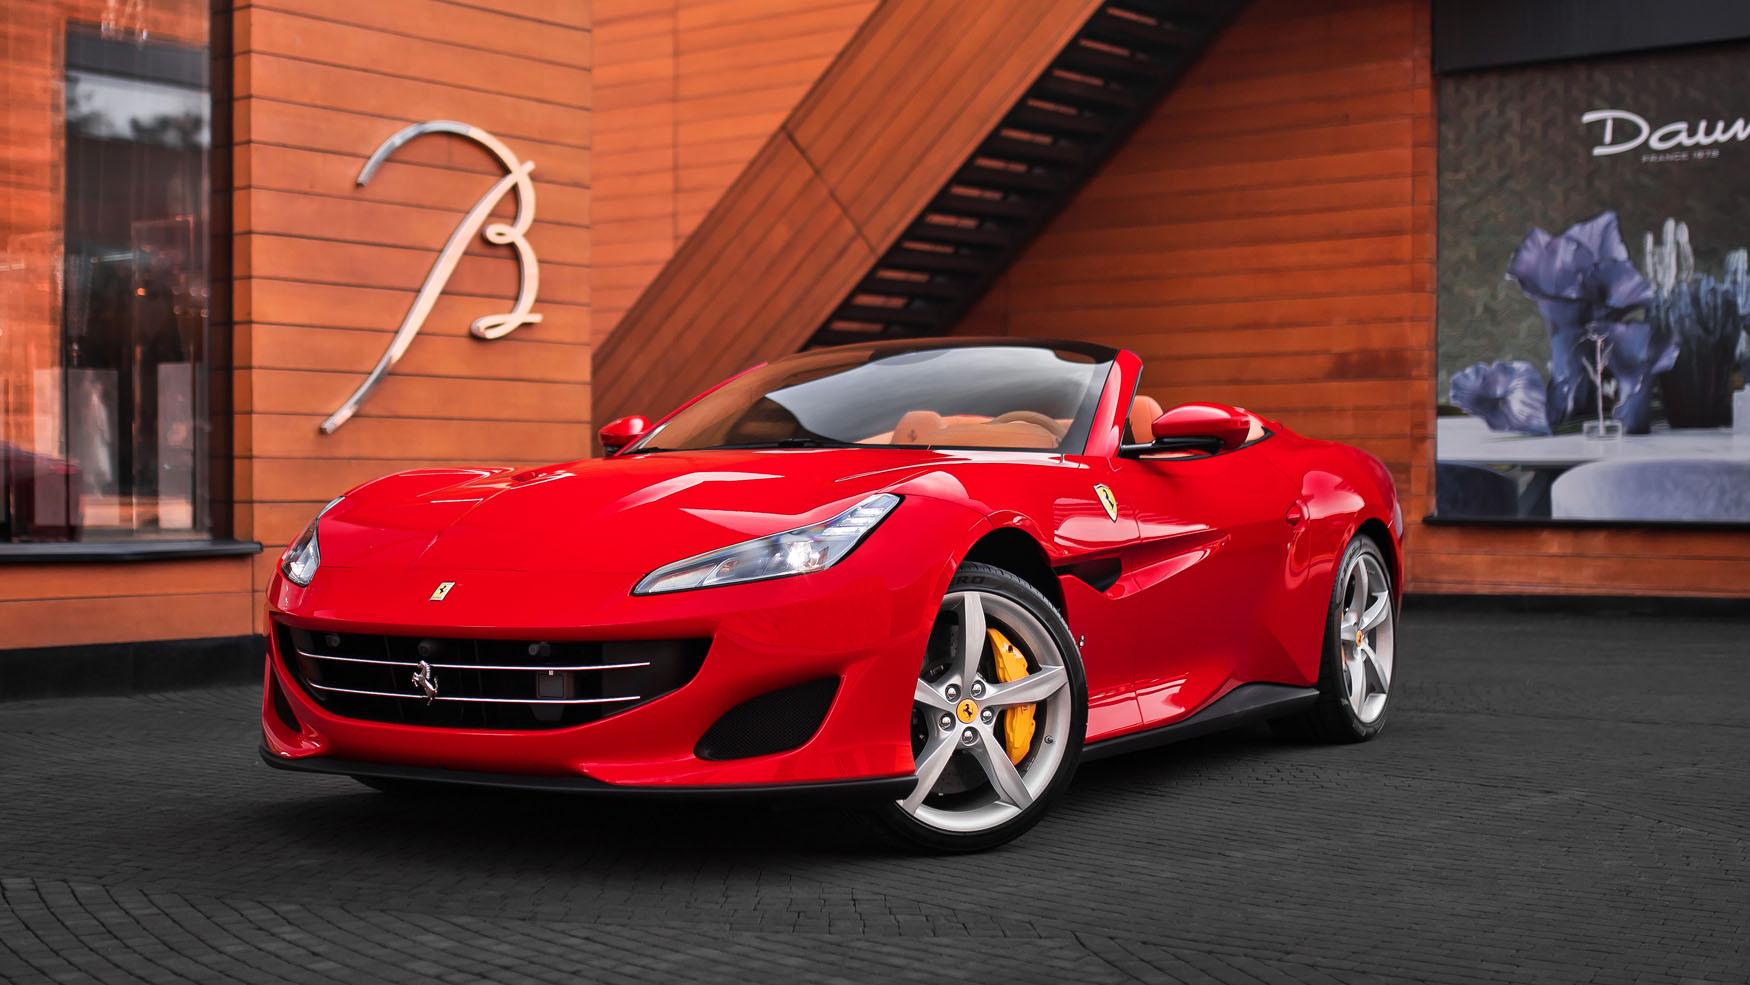 Ferrari в наличии - изображение 1 на Ferrarimoscow.ru!